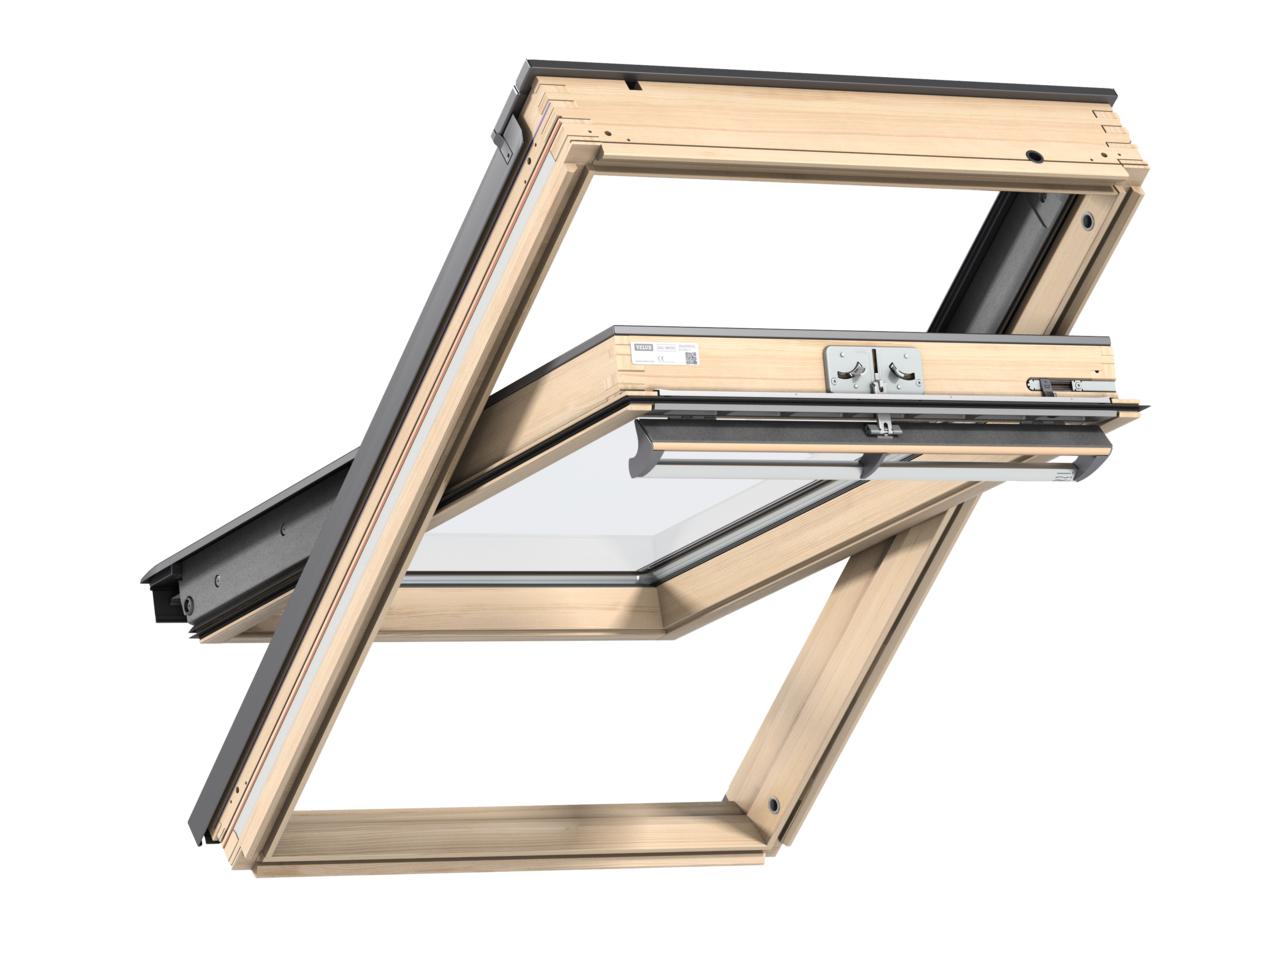 Velux GGL CK06 550 x 1180mm Centre Pivot Standard 70Pane Roof Window - Pine